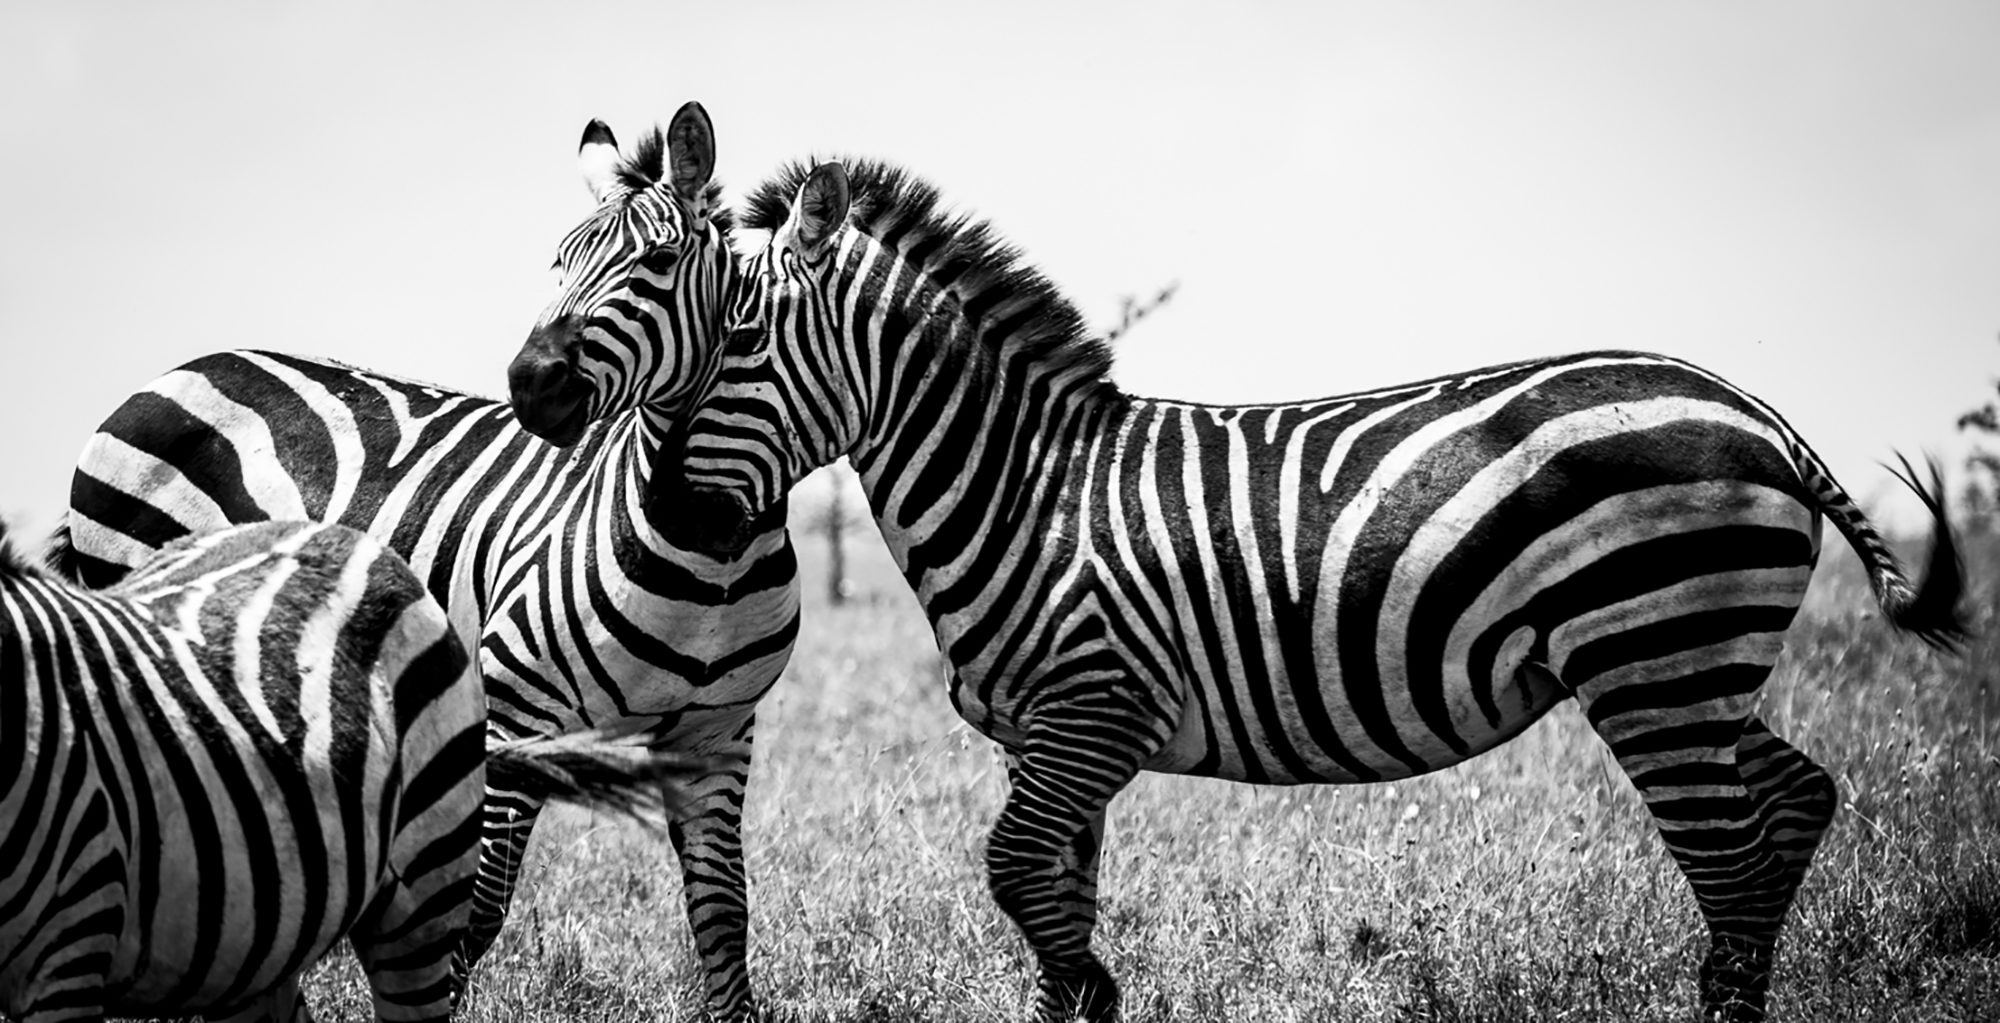 Kenya-Ariijju-Zebra